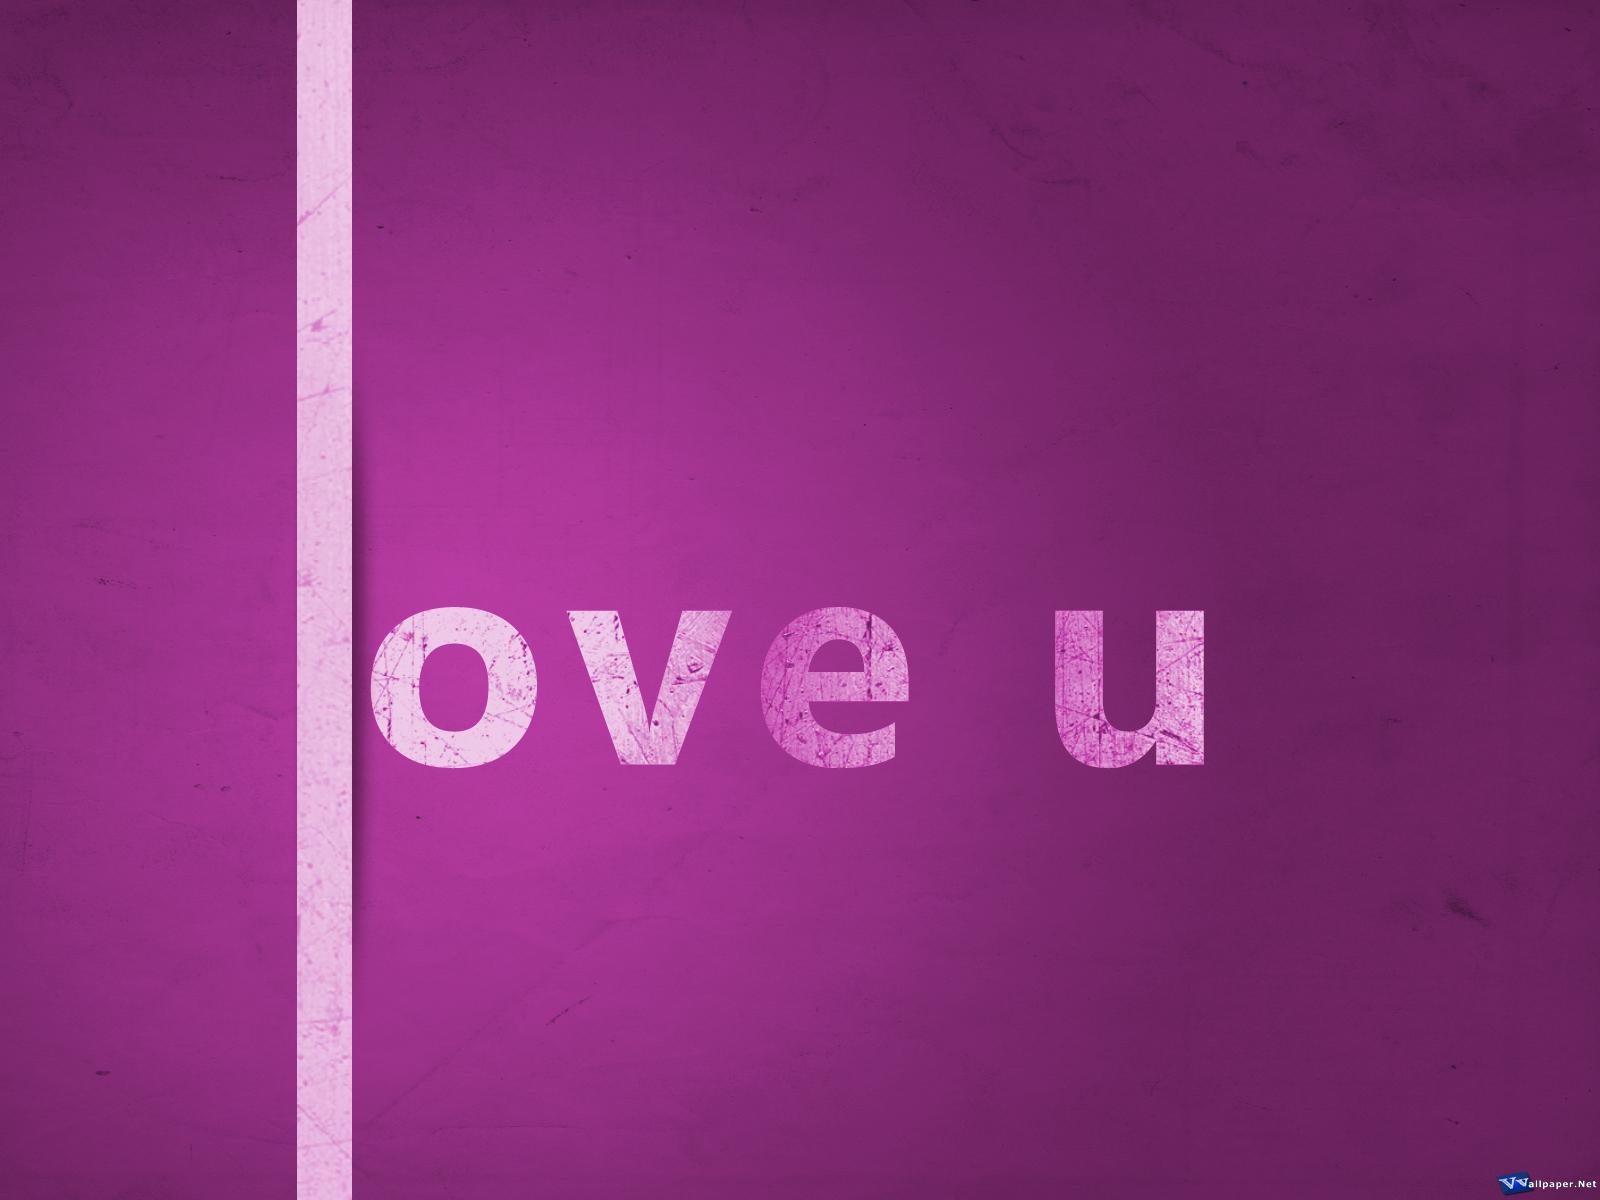 http://3.bp.blogspot.com/-tjjCJ1qWWjk/TpYfPV-HyzI/AAAAAAAADaM/Yg0_vsO7M04/s1600/Love_U_Wallpaper_Purple_Vvallpaper.Net.jpg